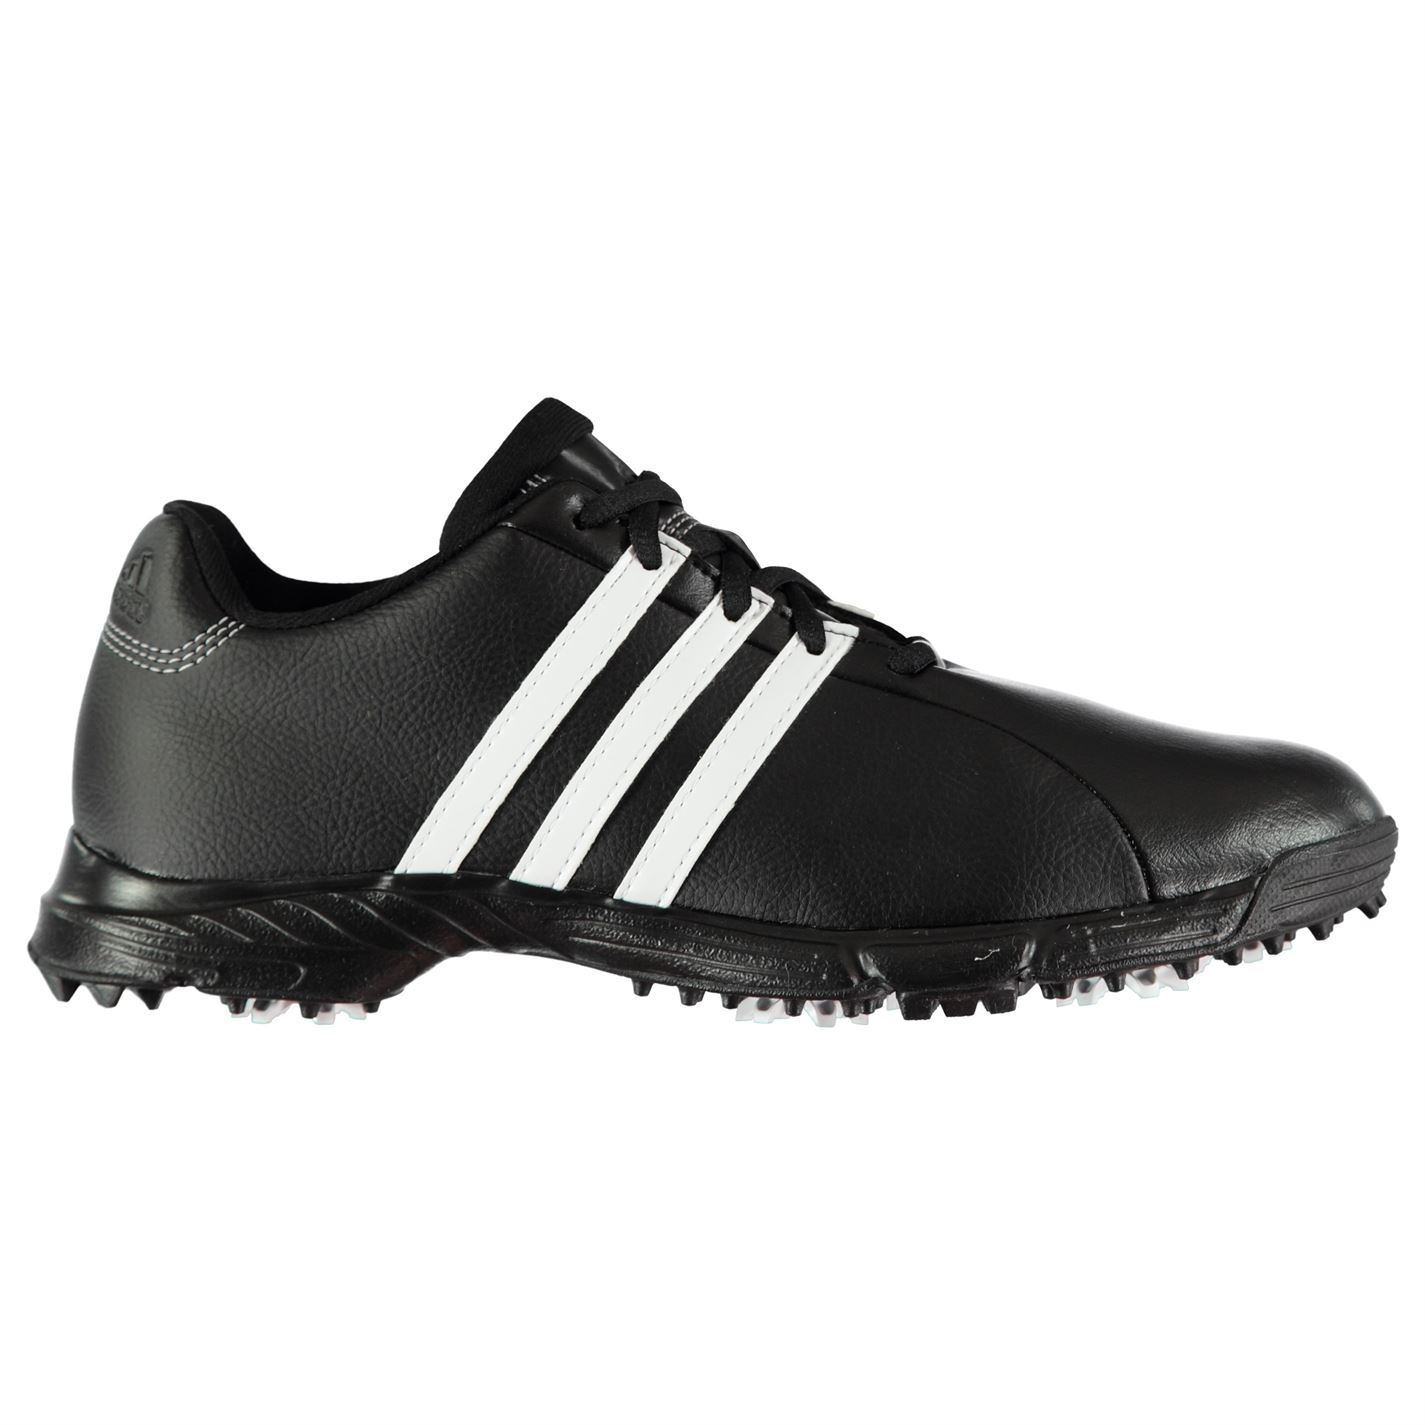 adidas-Golflite-Golf-Shoes-Mens-Spikes-Footwear thumbnail 9